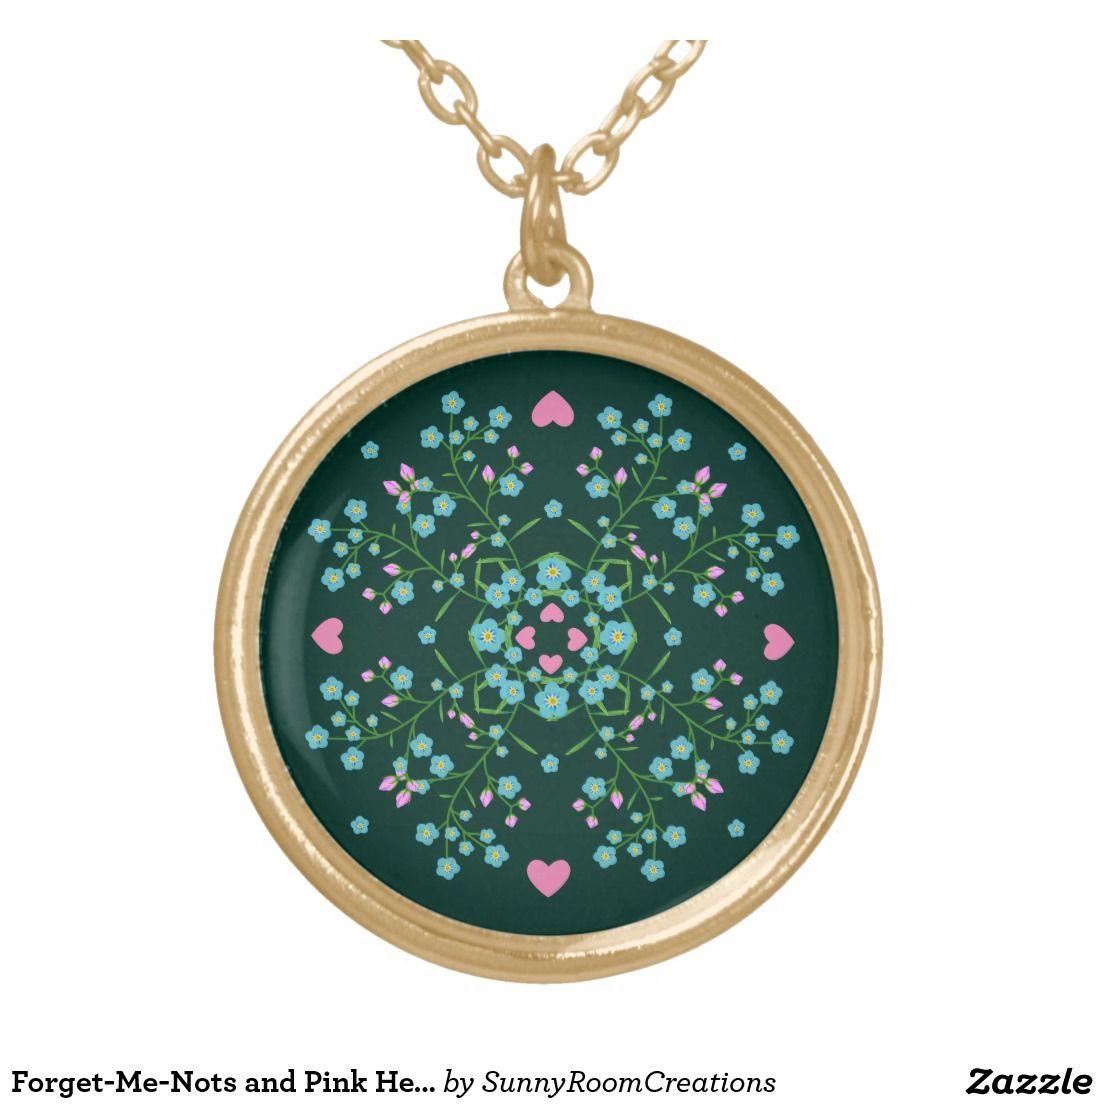 Forget-Me-Nots and Pink Hearts Mandala